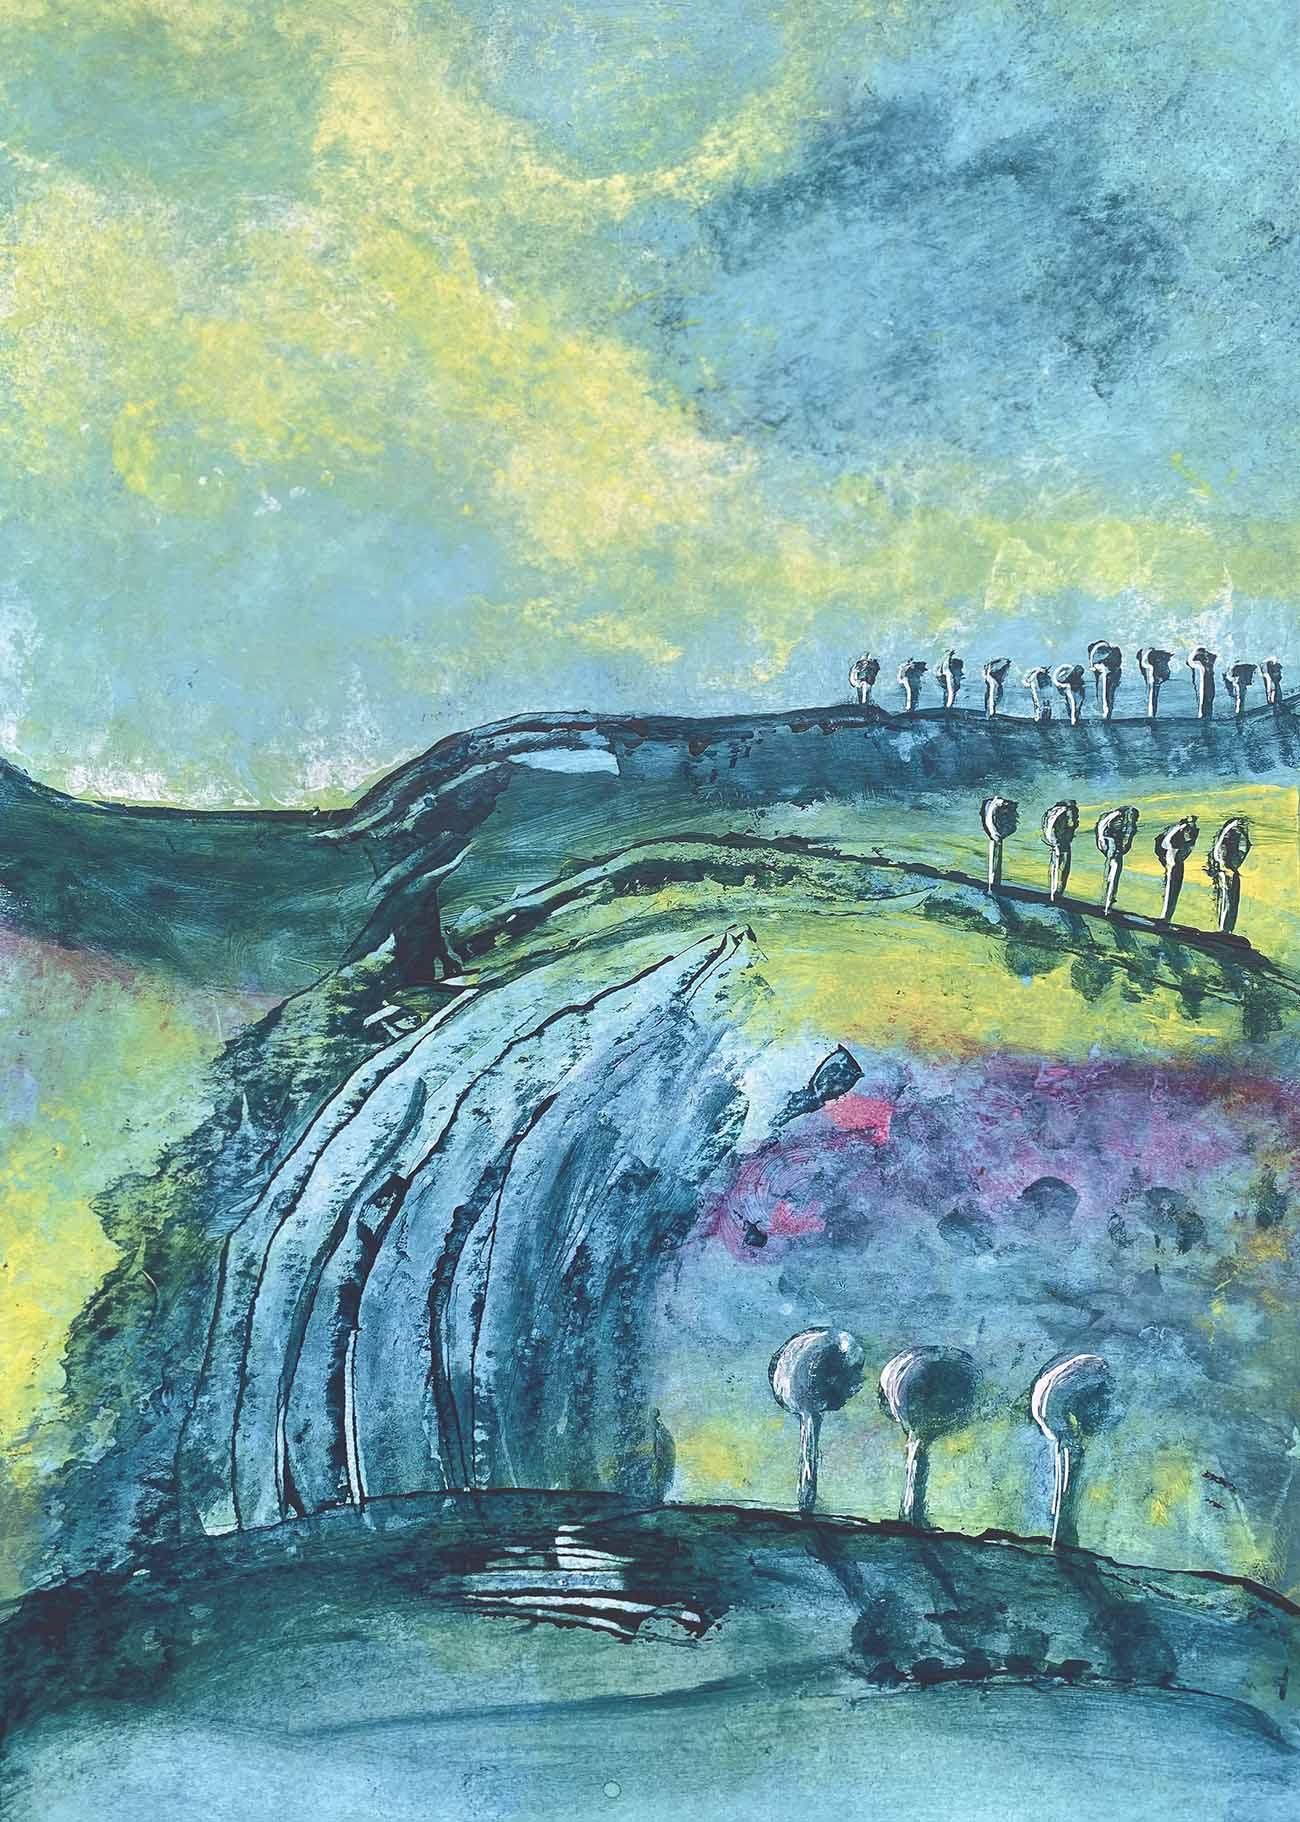 LR_Chasing_Waterfalls_Green_Leaf_Lena_Sarnfors_2021